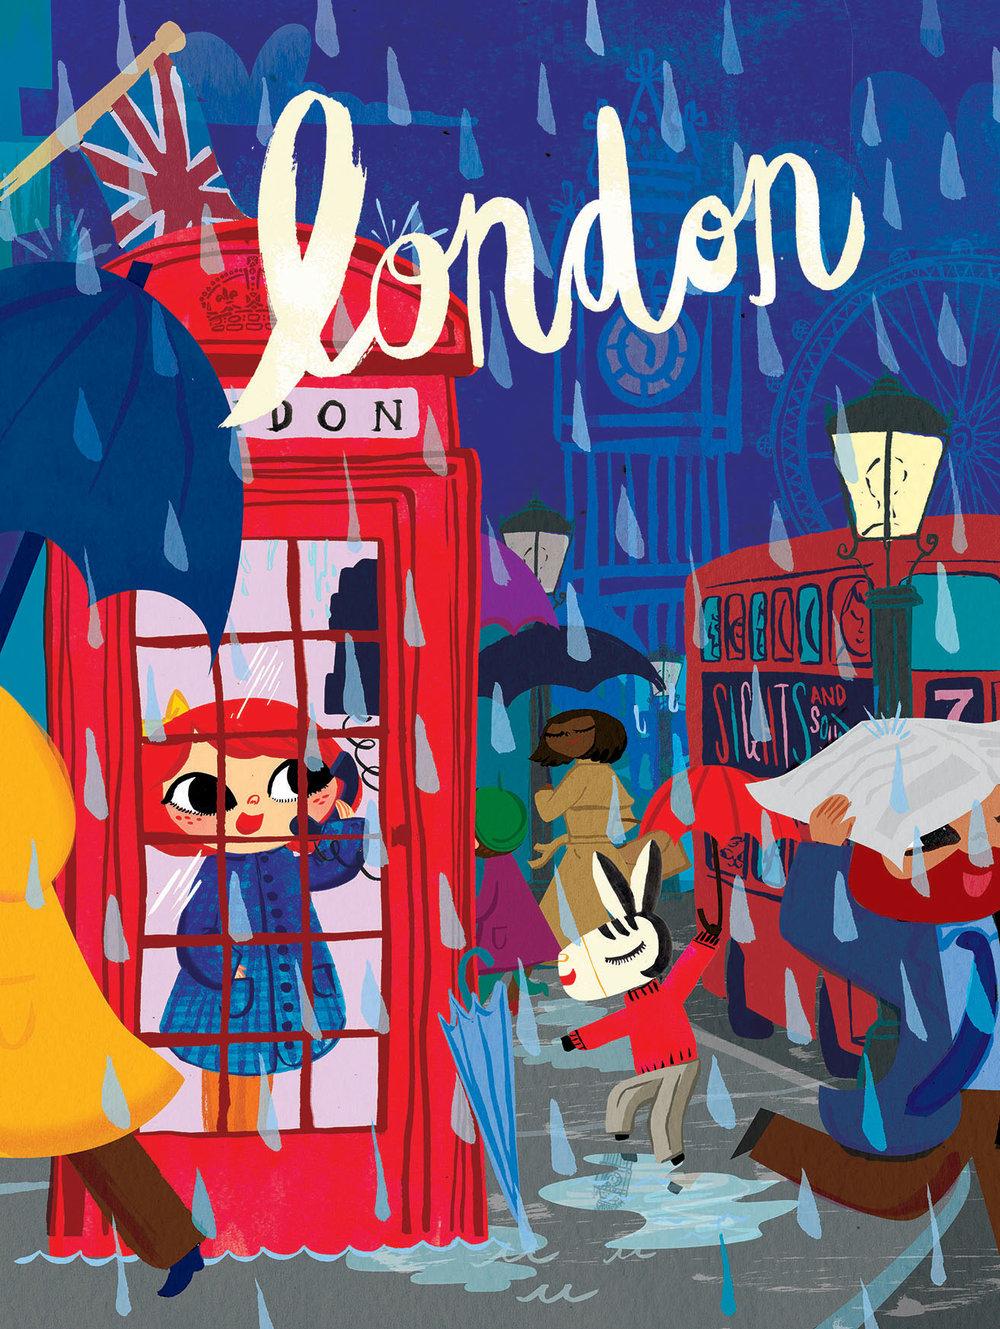 LondonLL